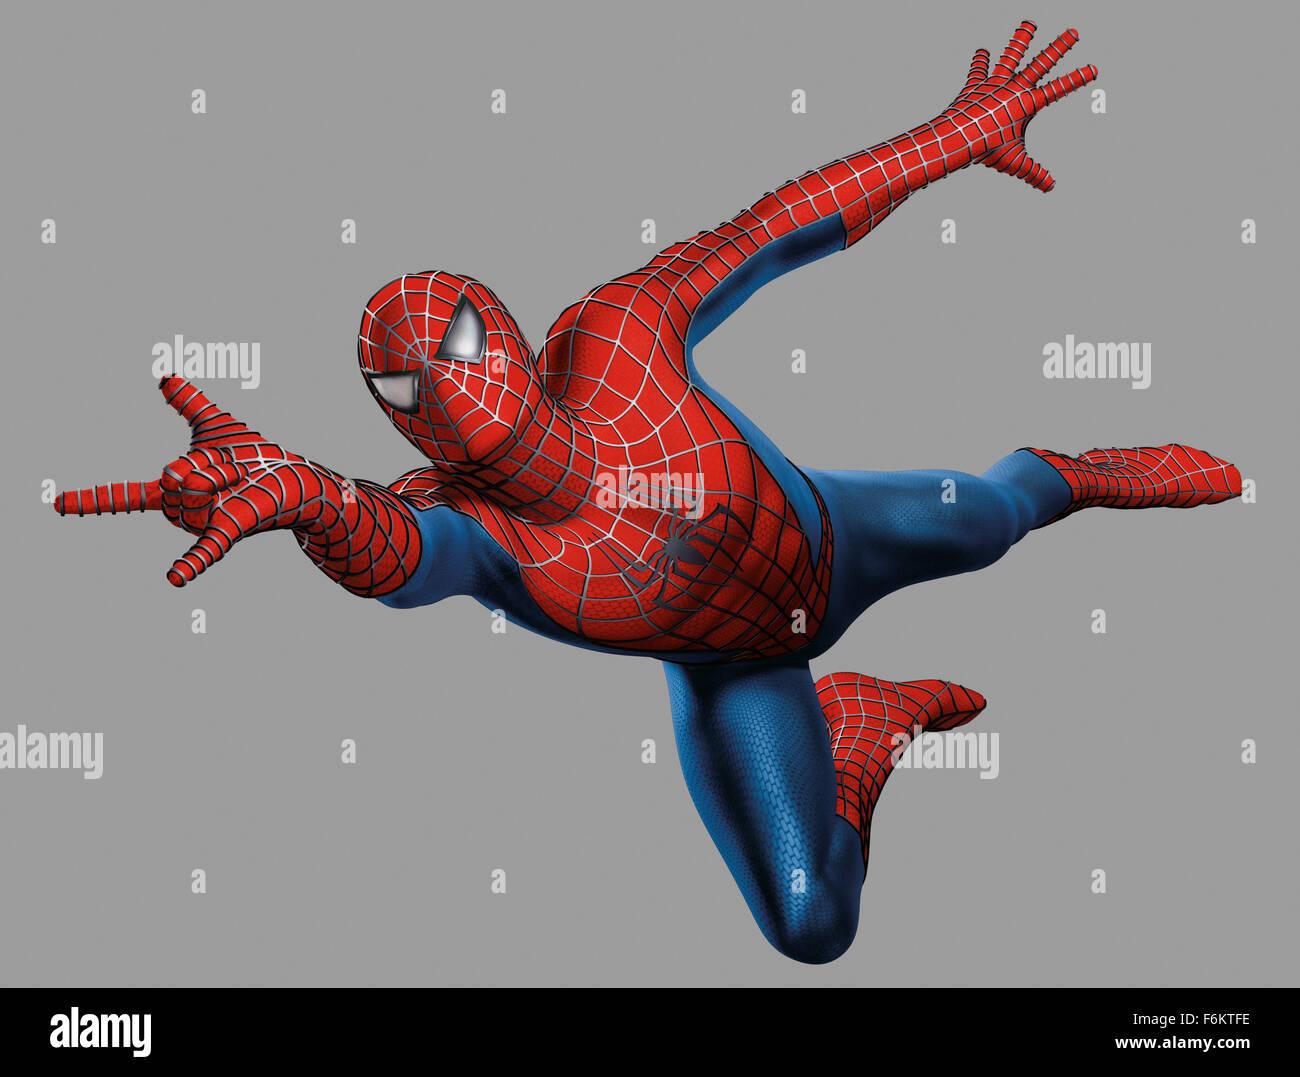 Spider man 3 release date in Perth